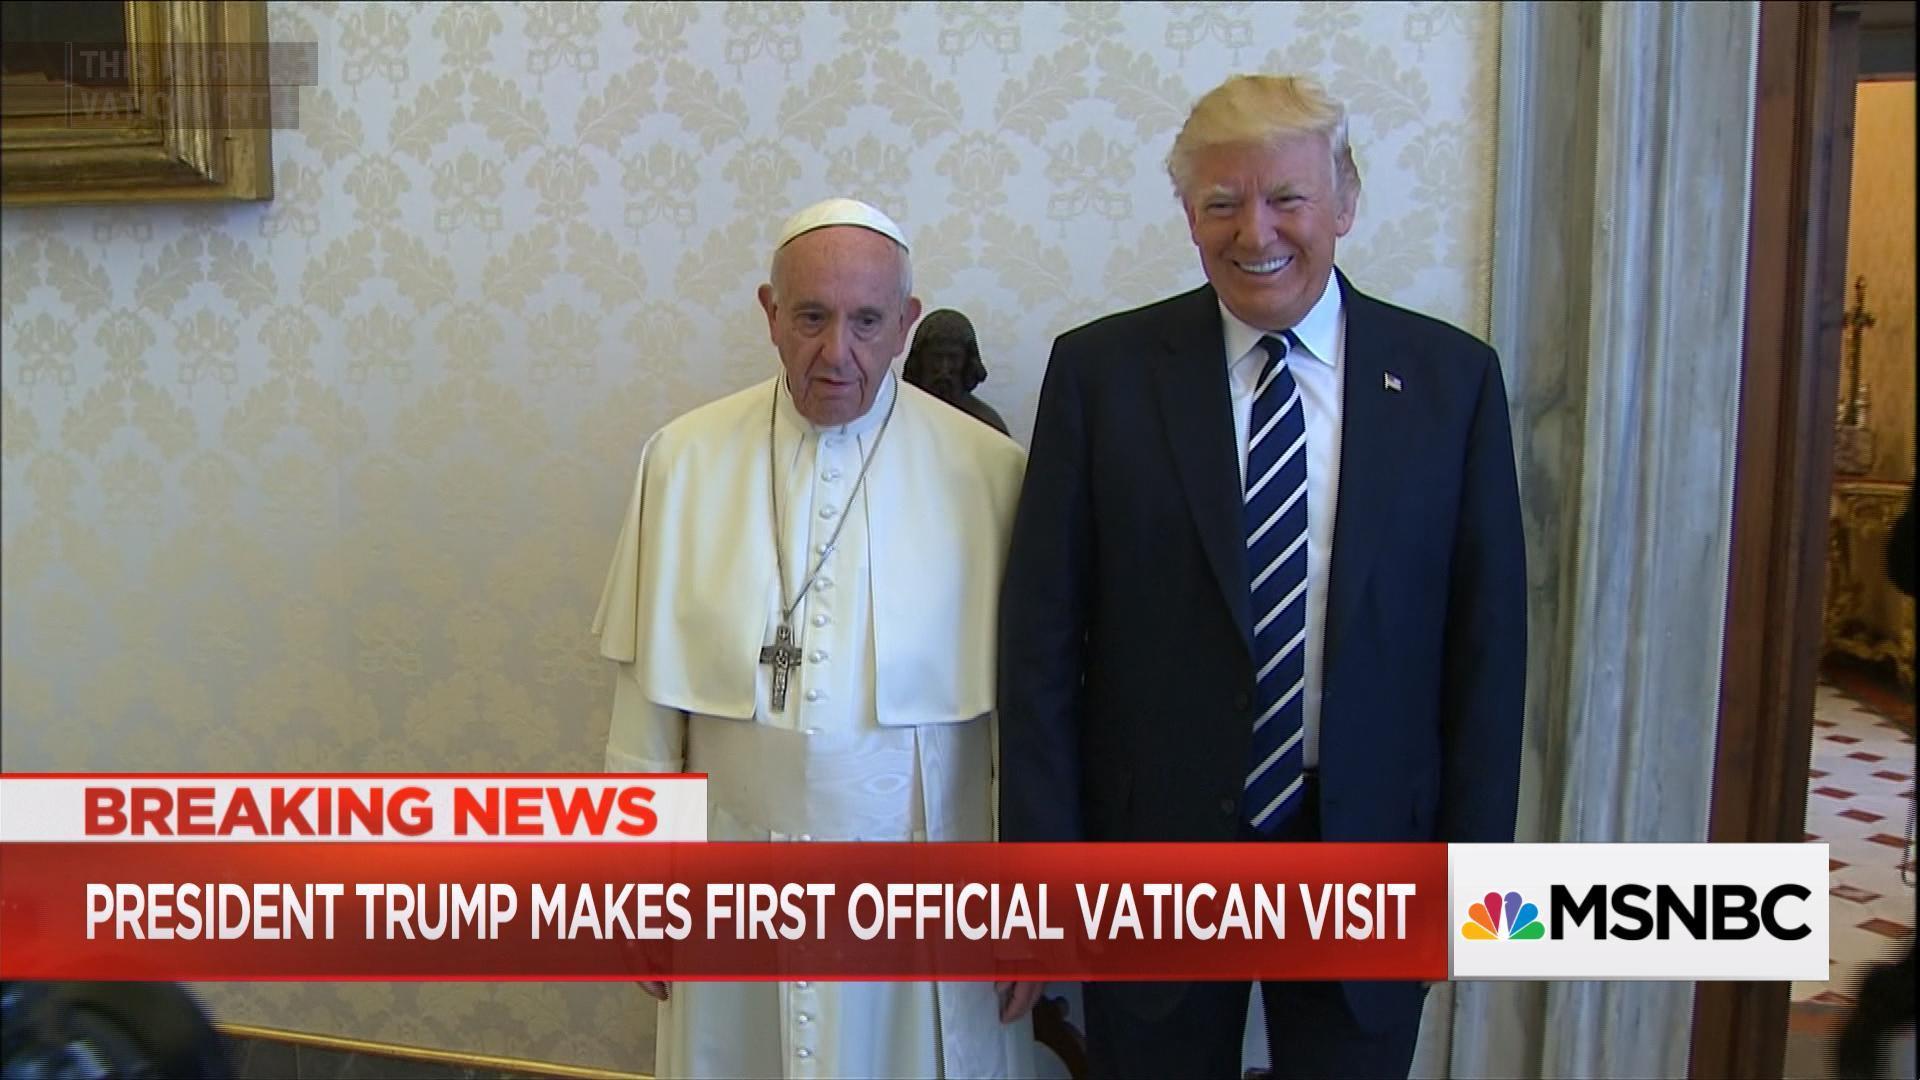 Outspoken Pope meets outspoken President